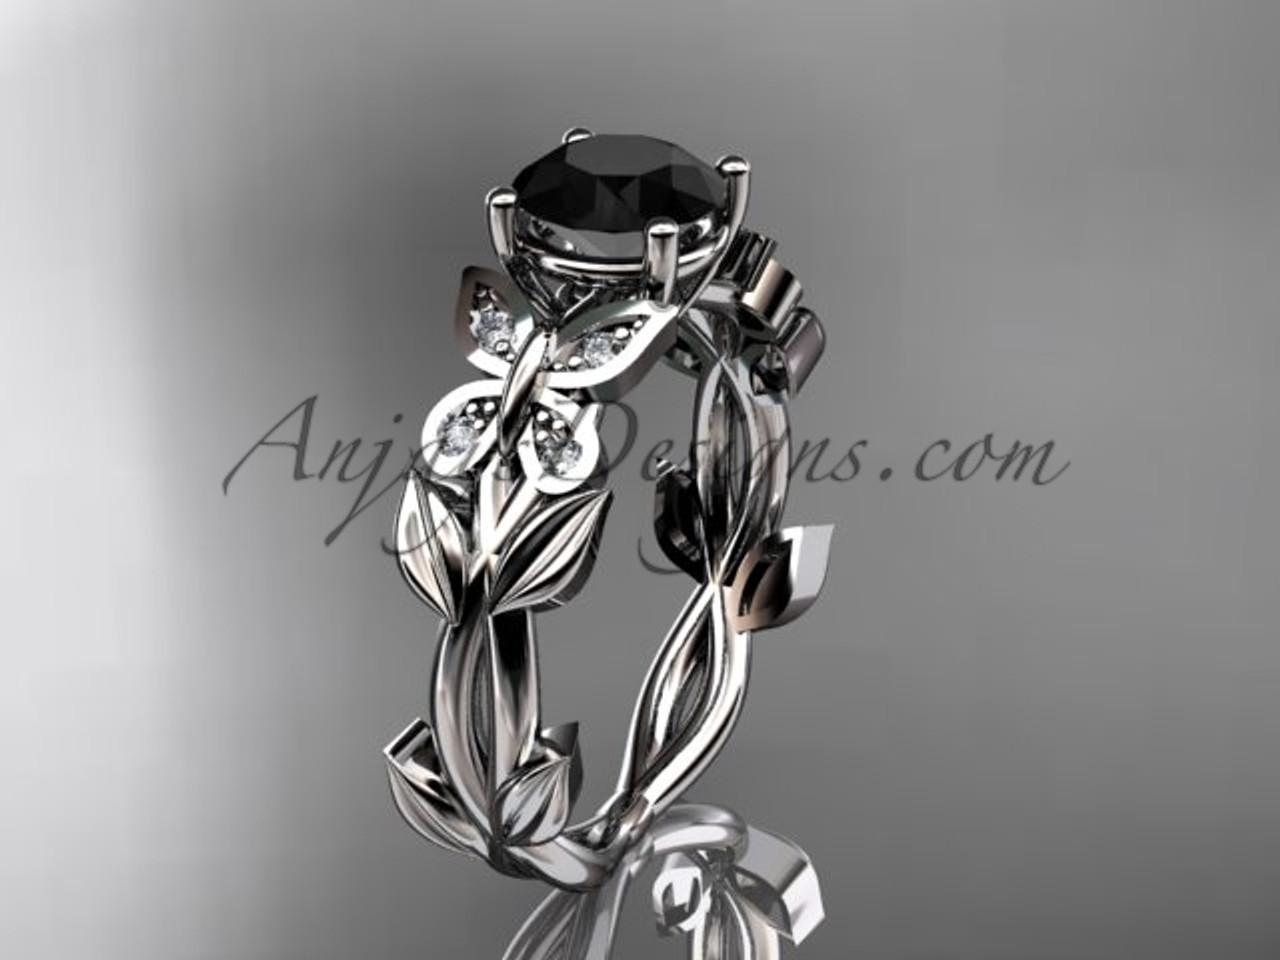 Black Diamond Wedding Ring.Butterfly Rings 14k White Gold Leaf Diamond Engagement Ring Black Diamond Wedding Ring Adlr526